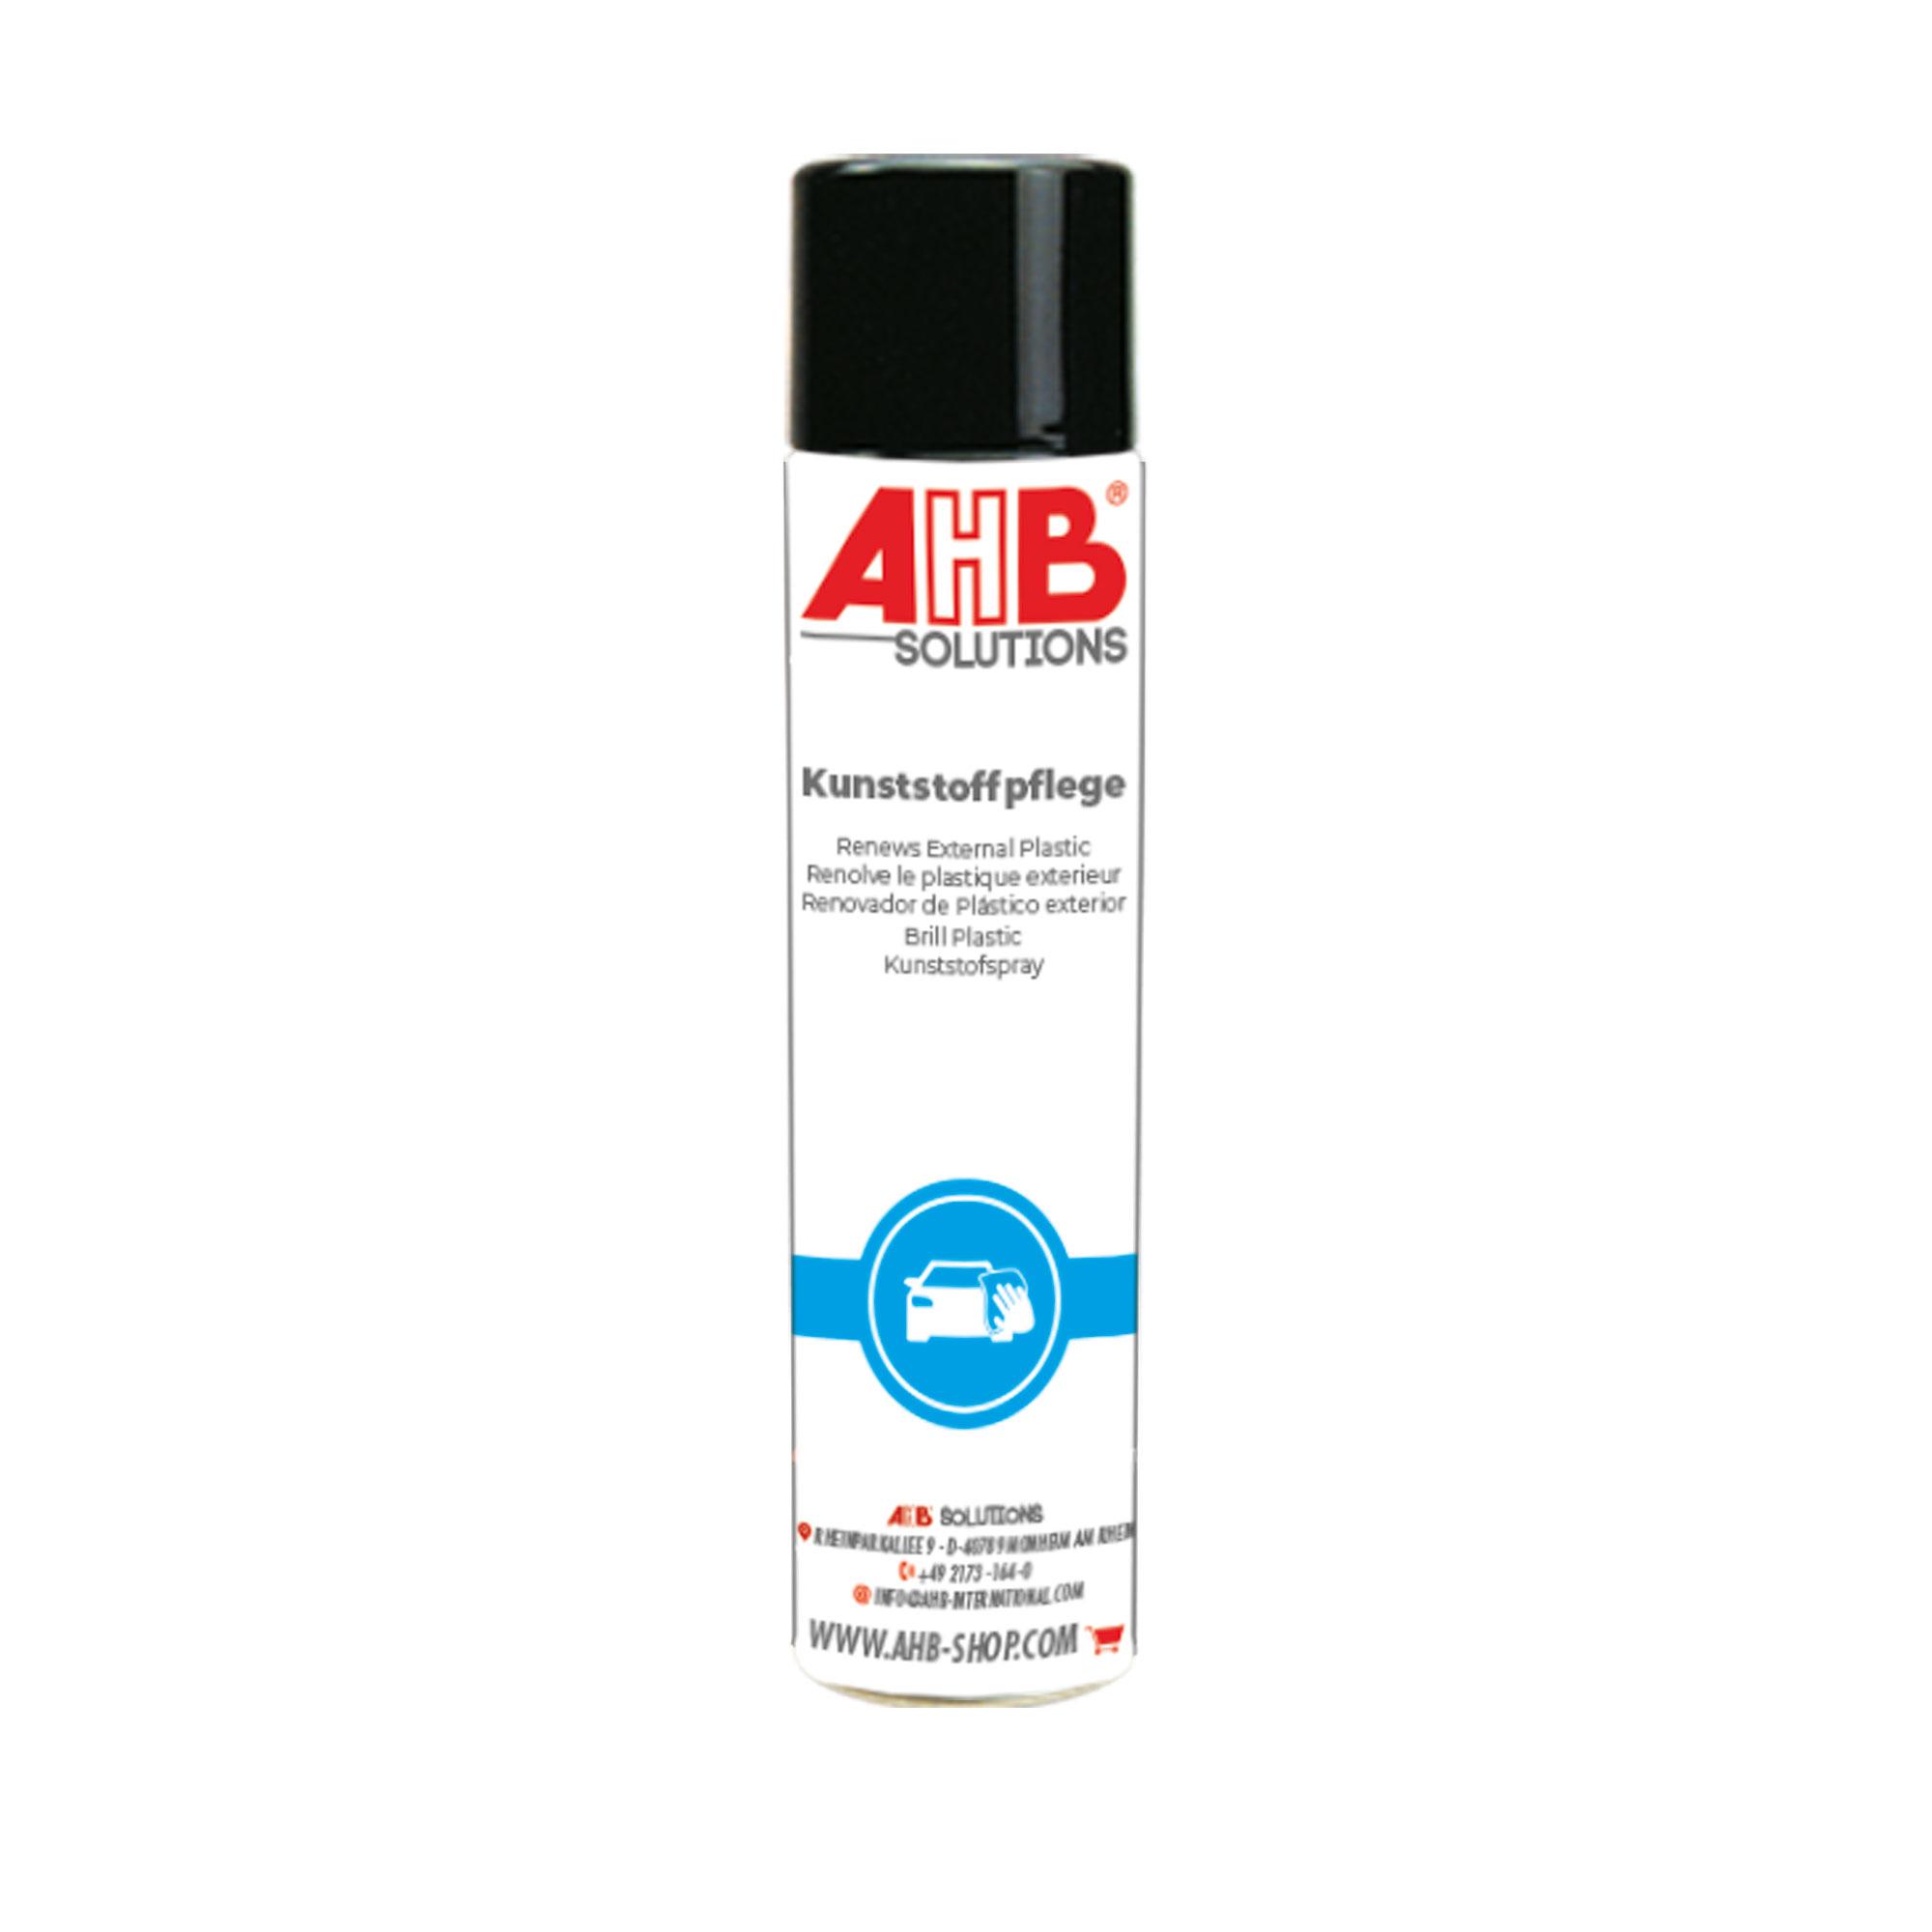 Kunststoffpflege-Spray